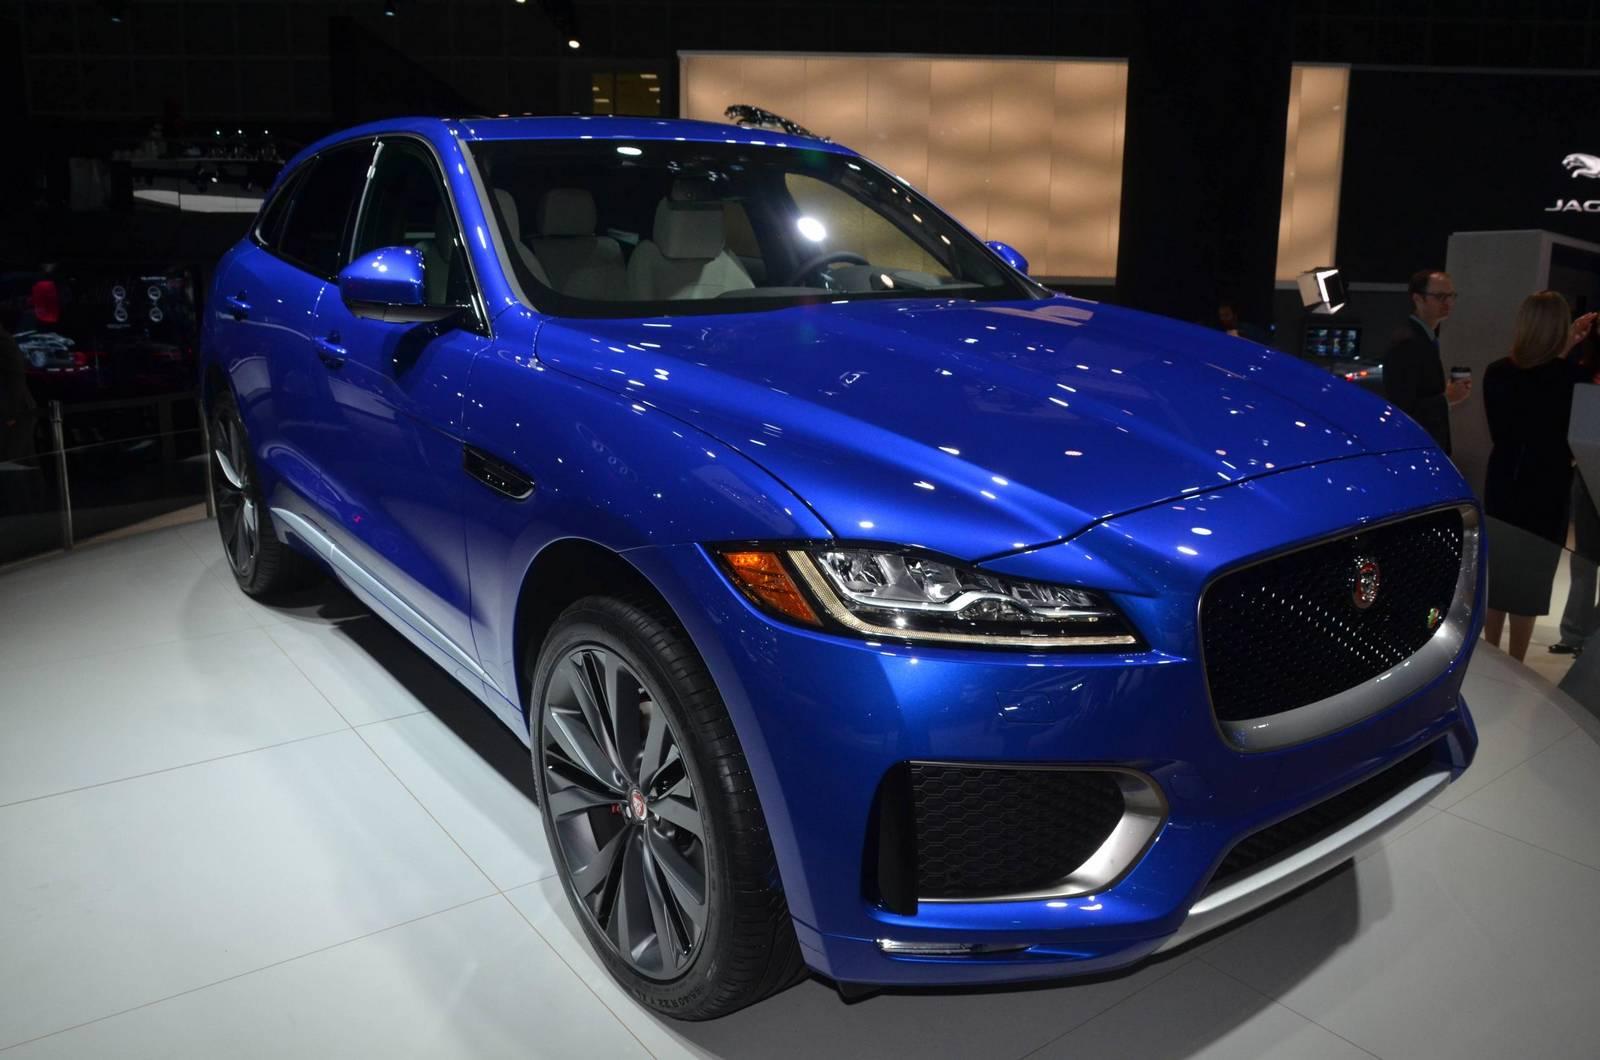 Los Angeles 2015: Jaguar F-Pace - GTspirit